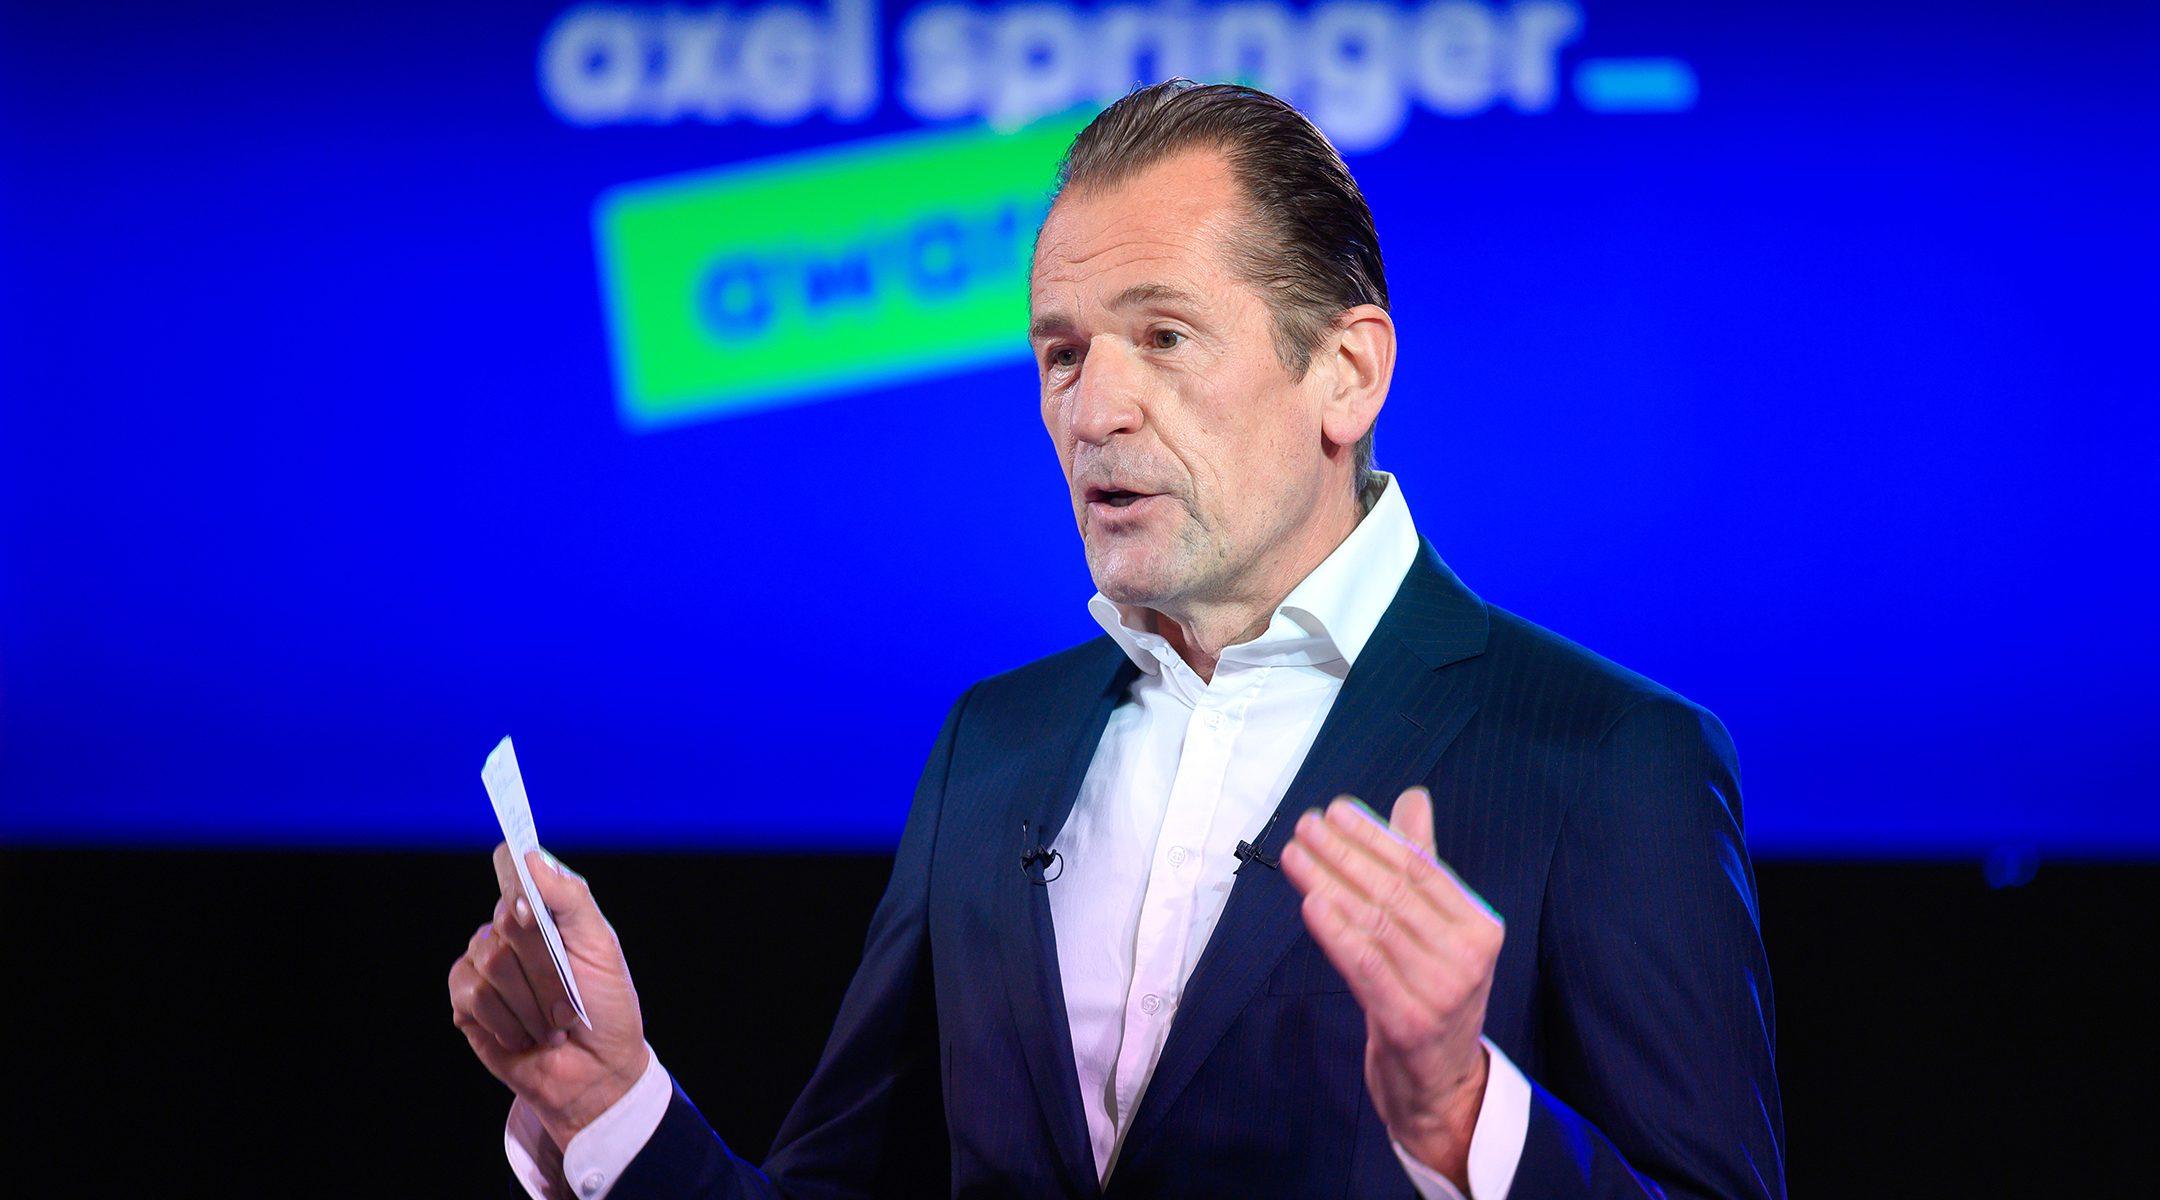 Mathias Döpfner, CEO of Axel Springer SE, speaks at the opening of the Axel Springer Award ceremony in Berlin, Germany on March 18, 2021. (Bernd von Jutrczenka - Pool/Getty Images)